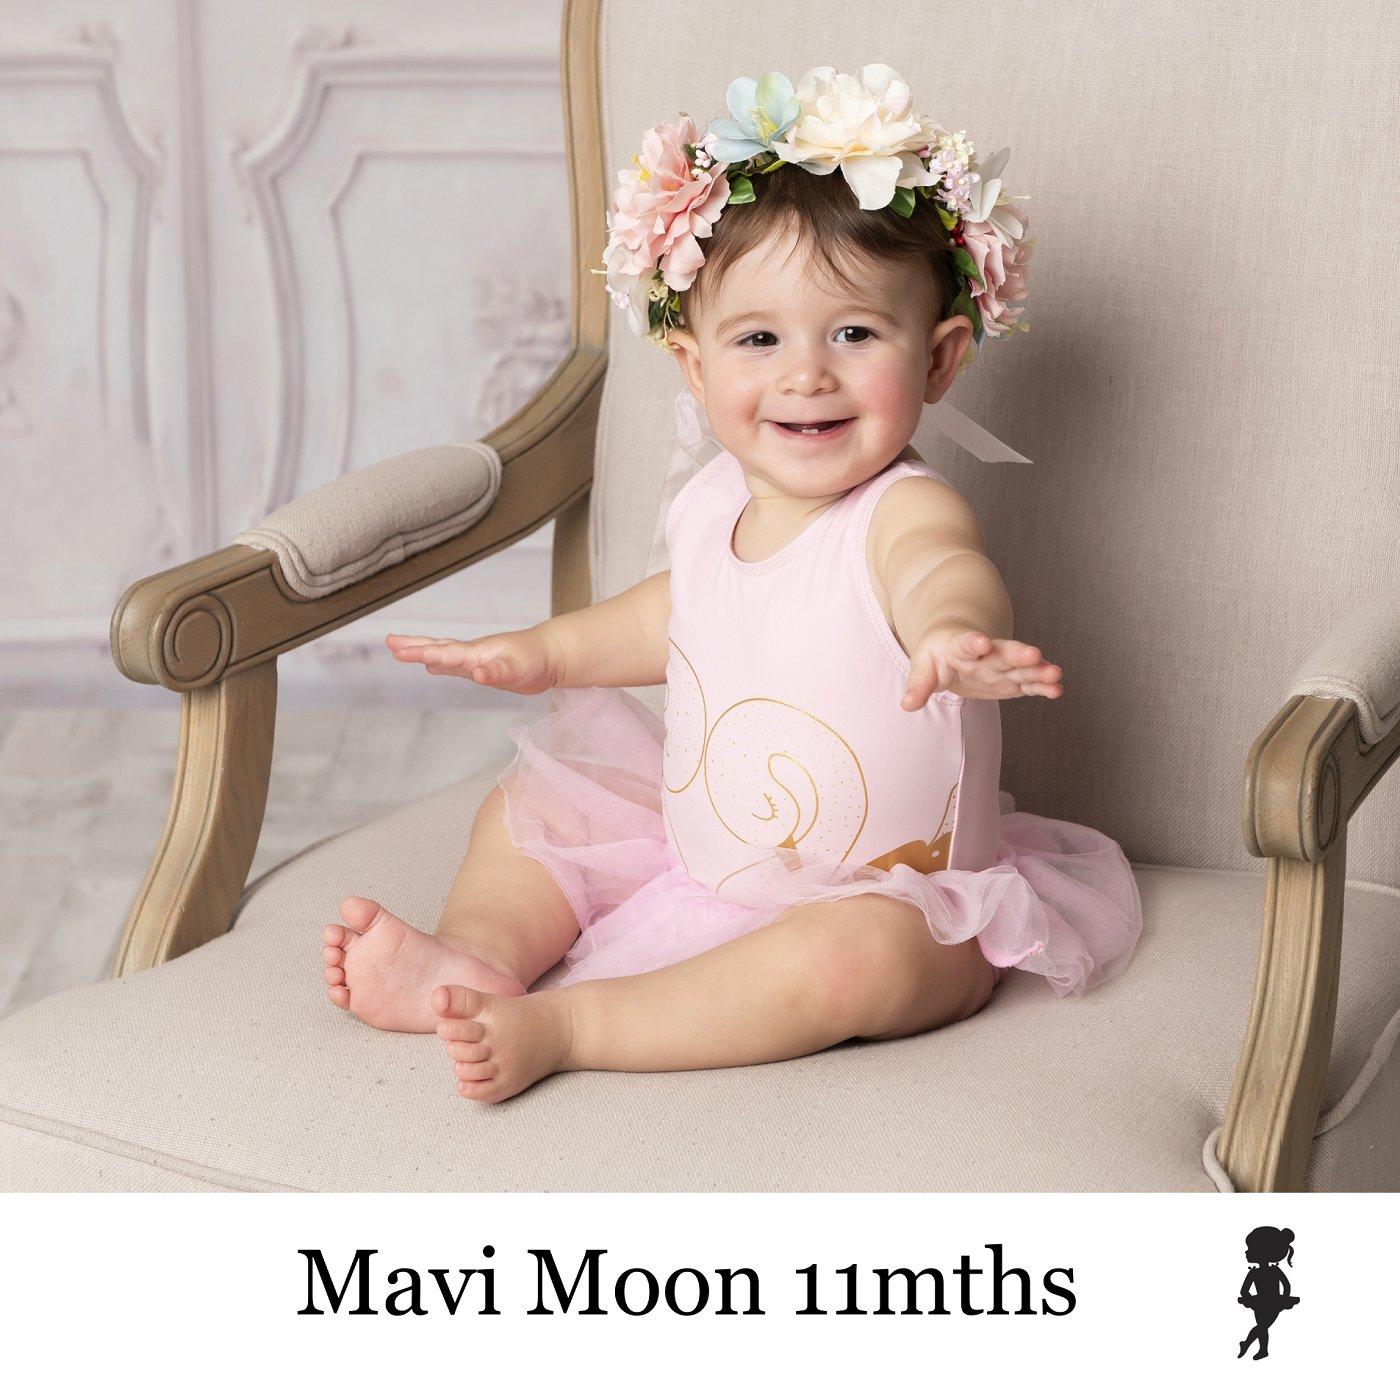 LB14019- Mavi Moon 11mths.jpg